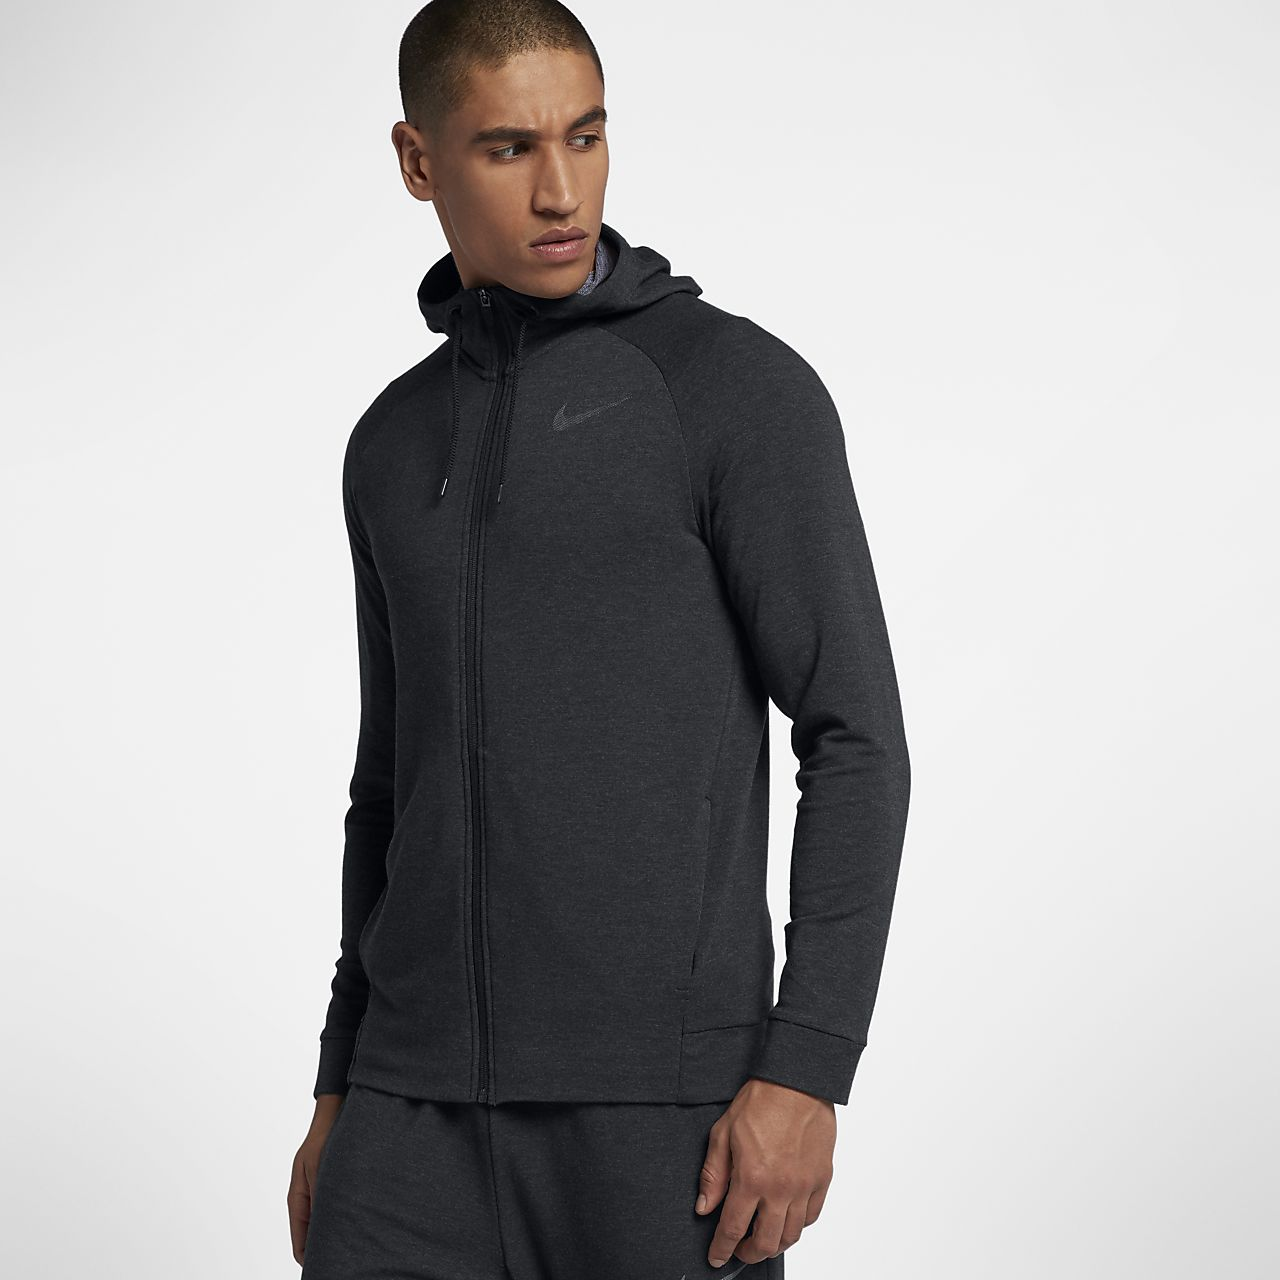 7dcfff2316e8 Nike Dri-FIT Men s Full-Zip Training Hoodie. Nike.com FI